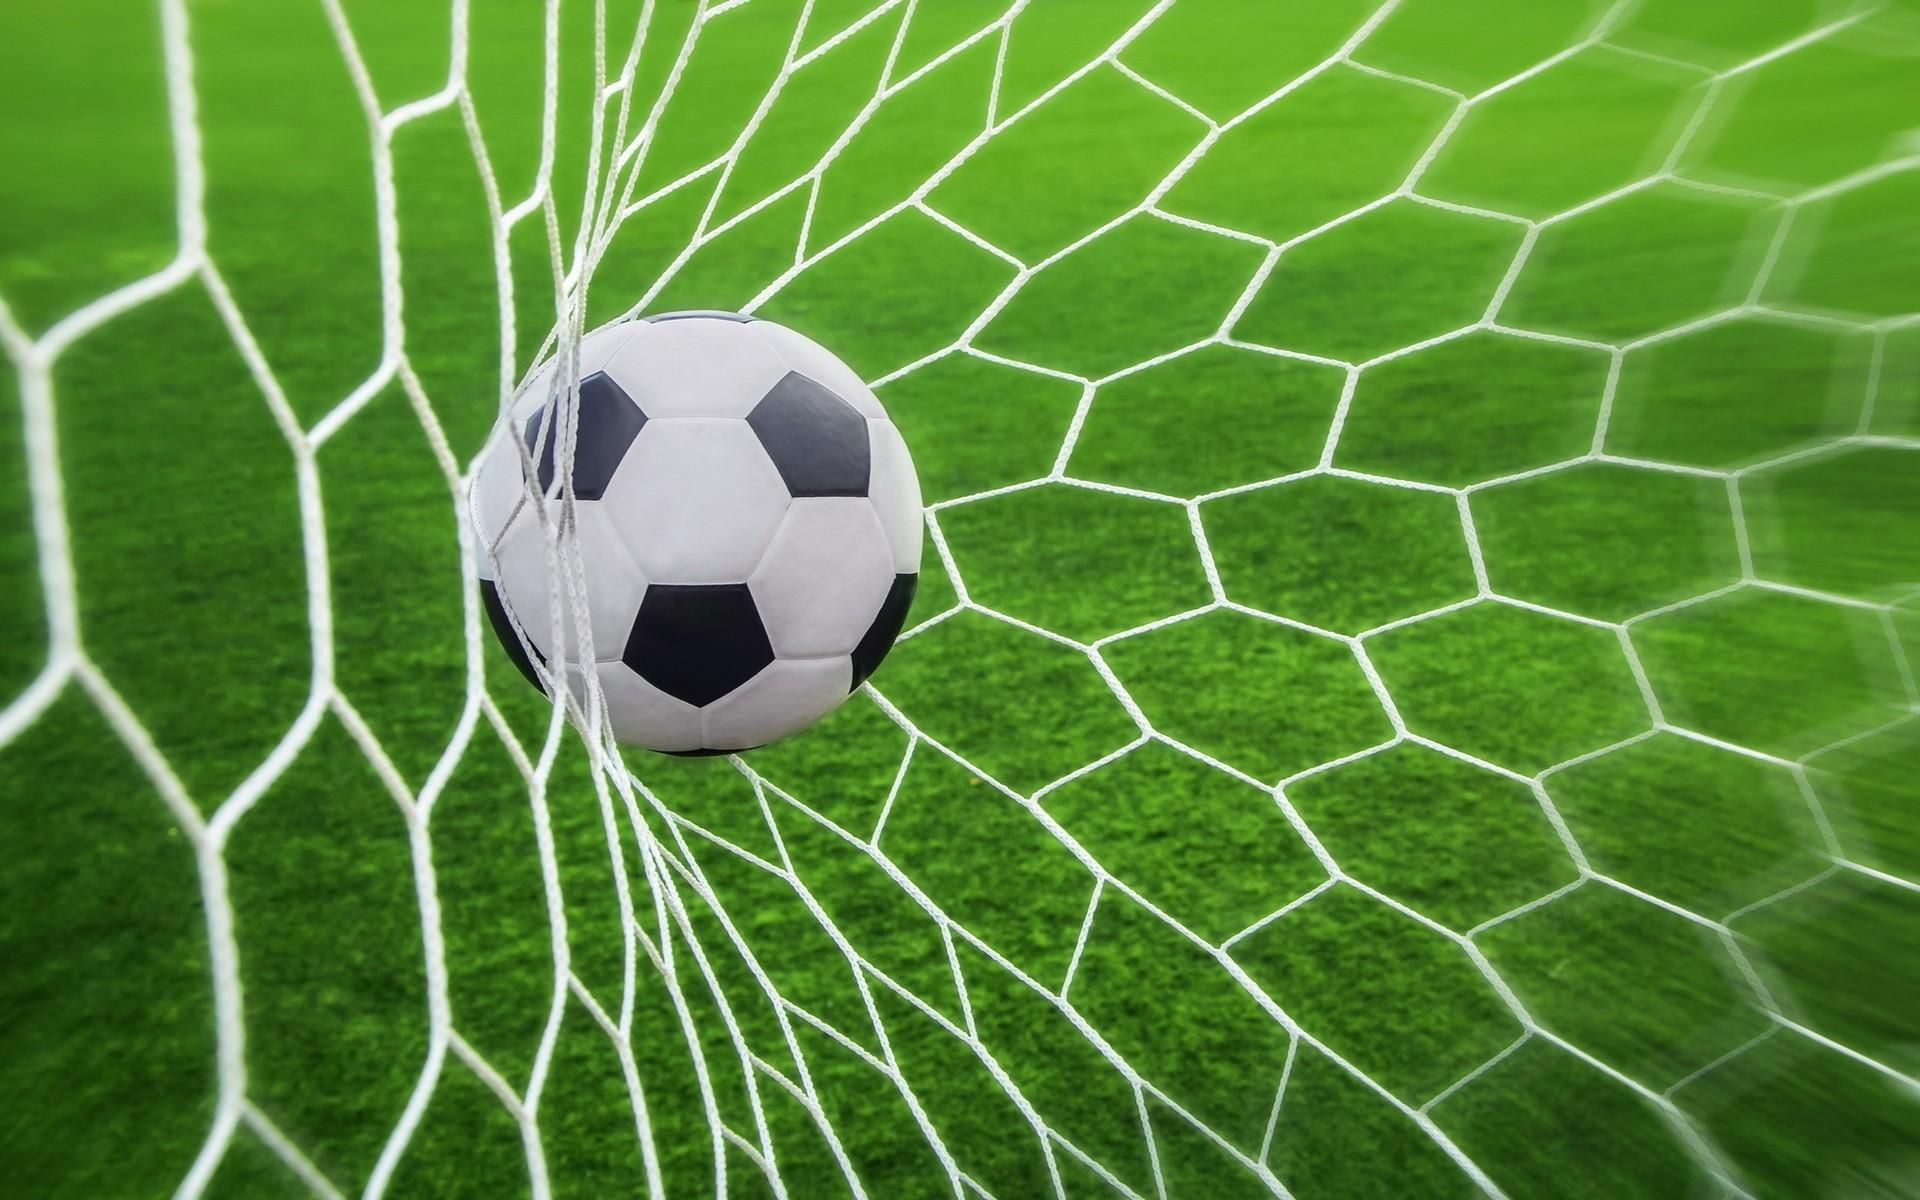 Free Soccer Goal phone wallpaper by immdatguy